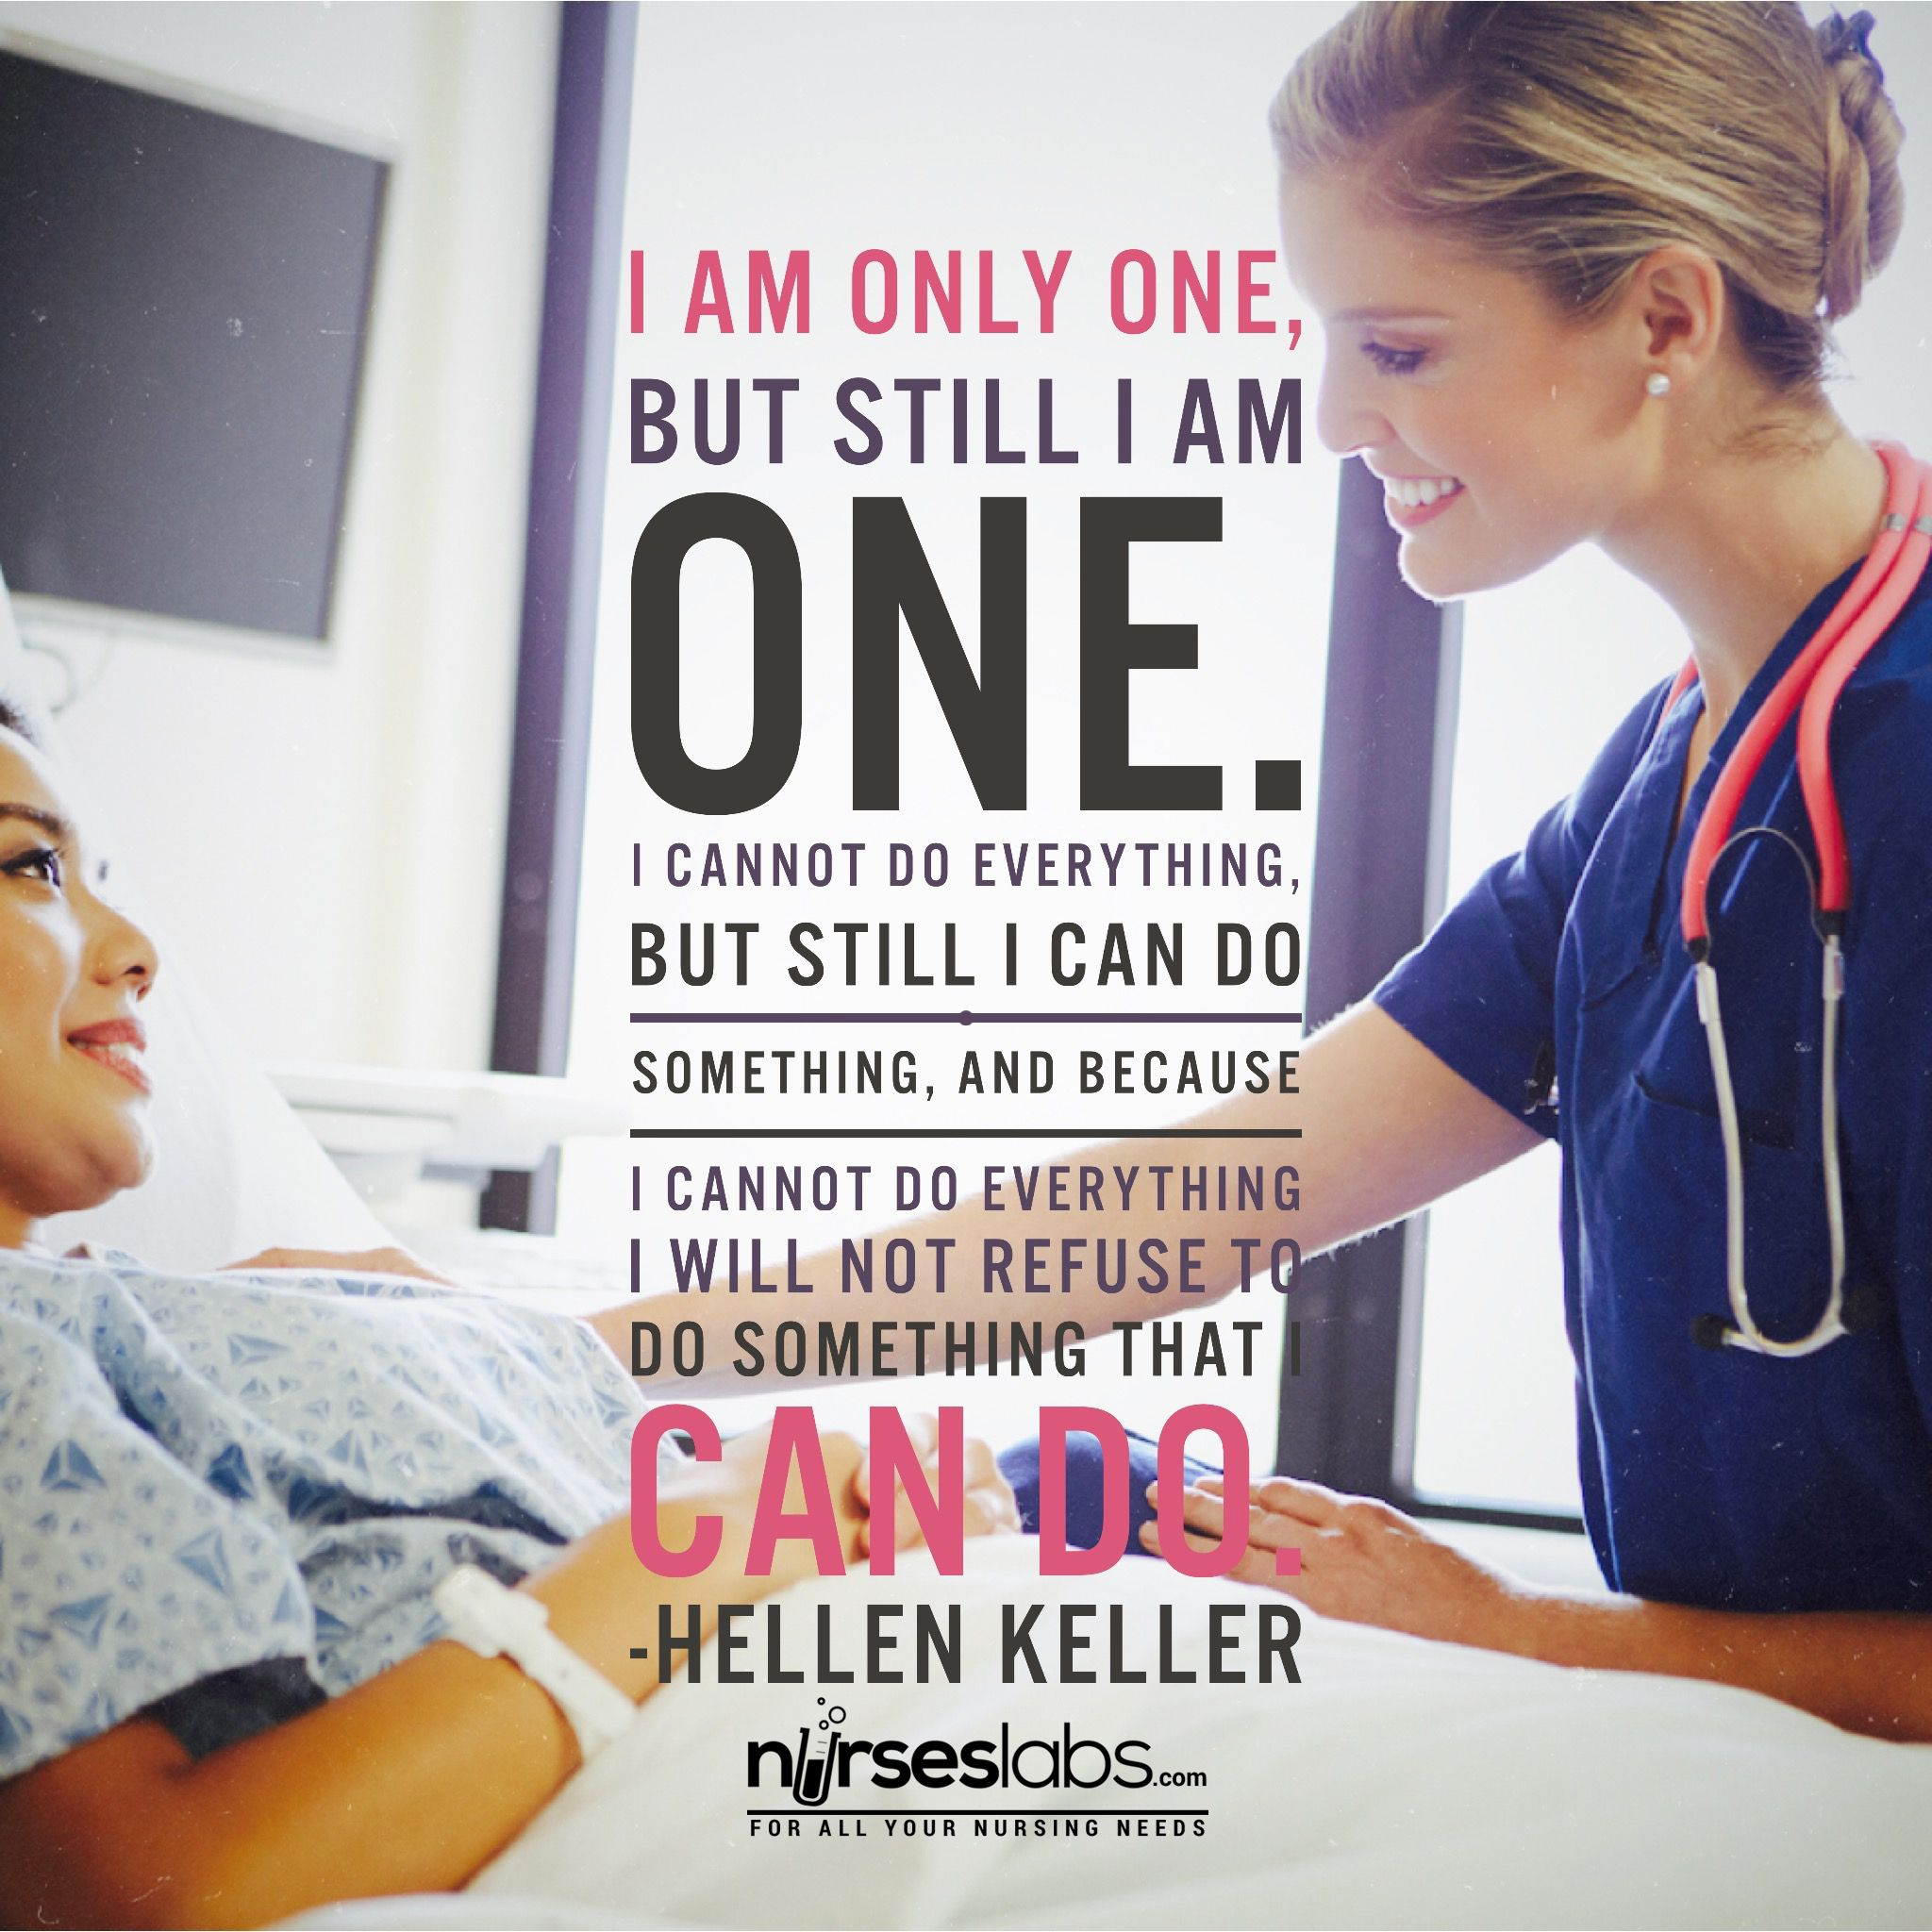 80 Nurse Quotes to Inspire, Motivate, and Humor Nurses